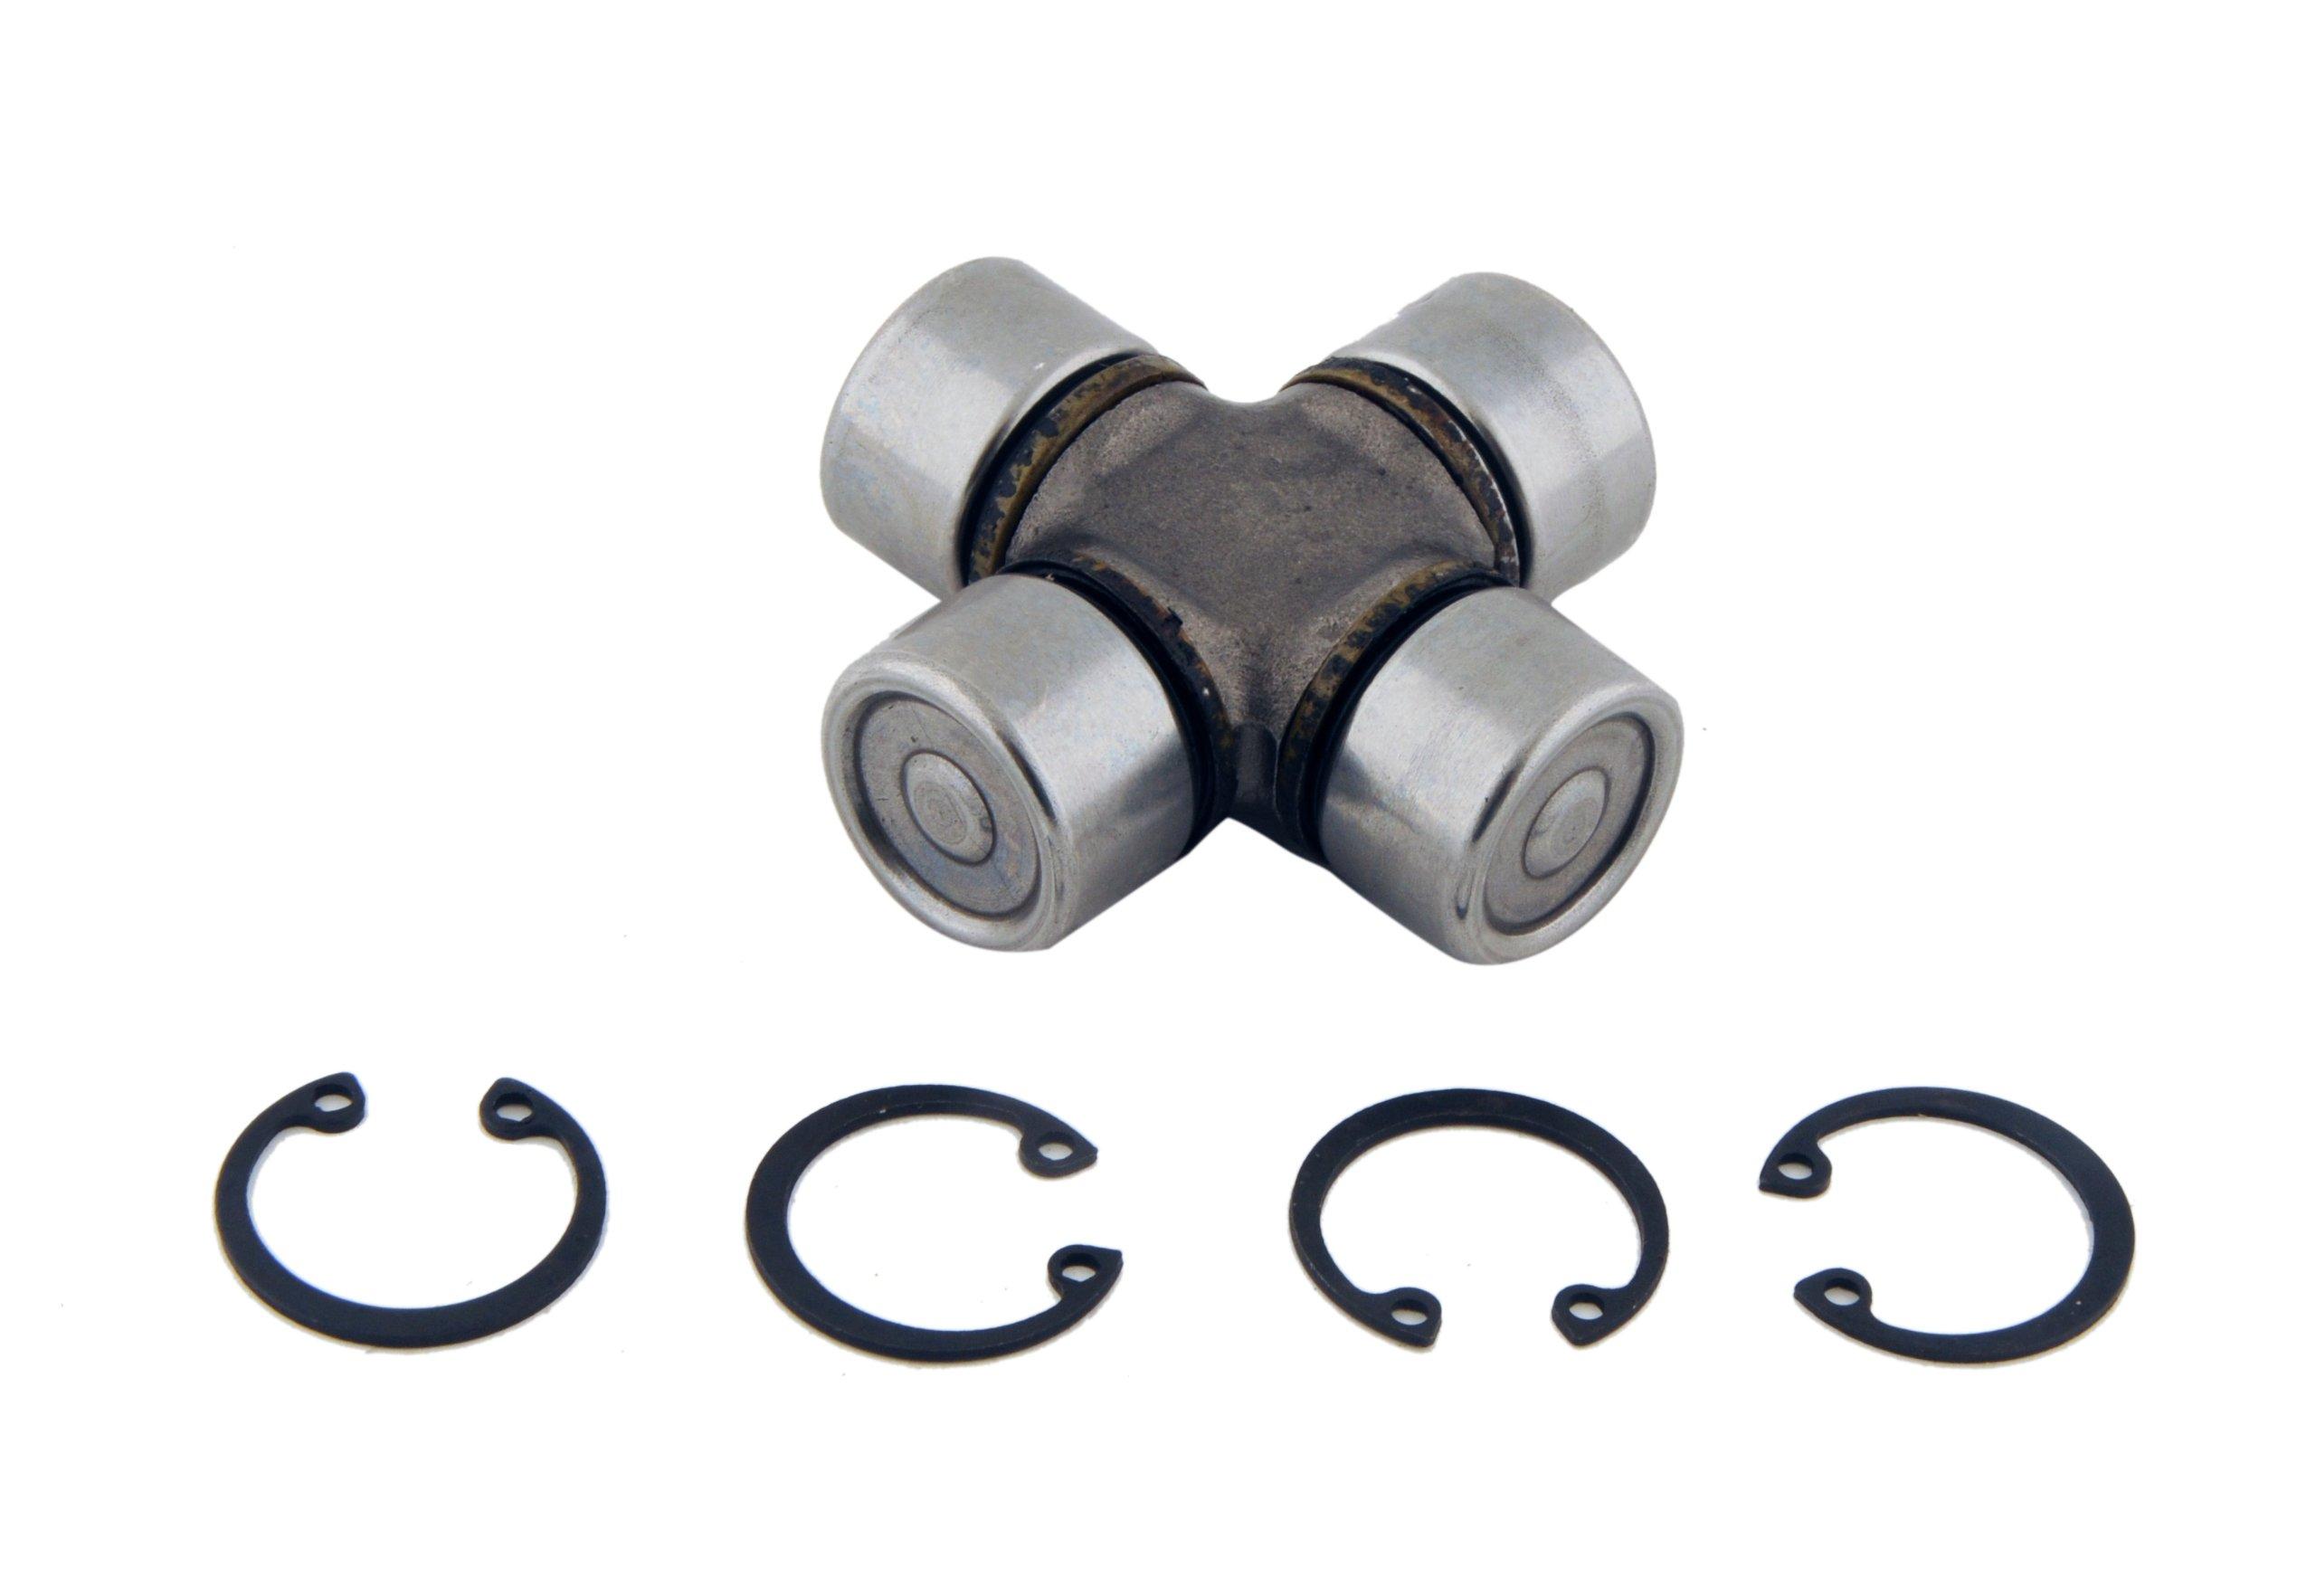 MTC 9272/04371-36030 Driveshaft U-Joint (Stake in Style 04371-36030 MTC 9272)